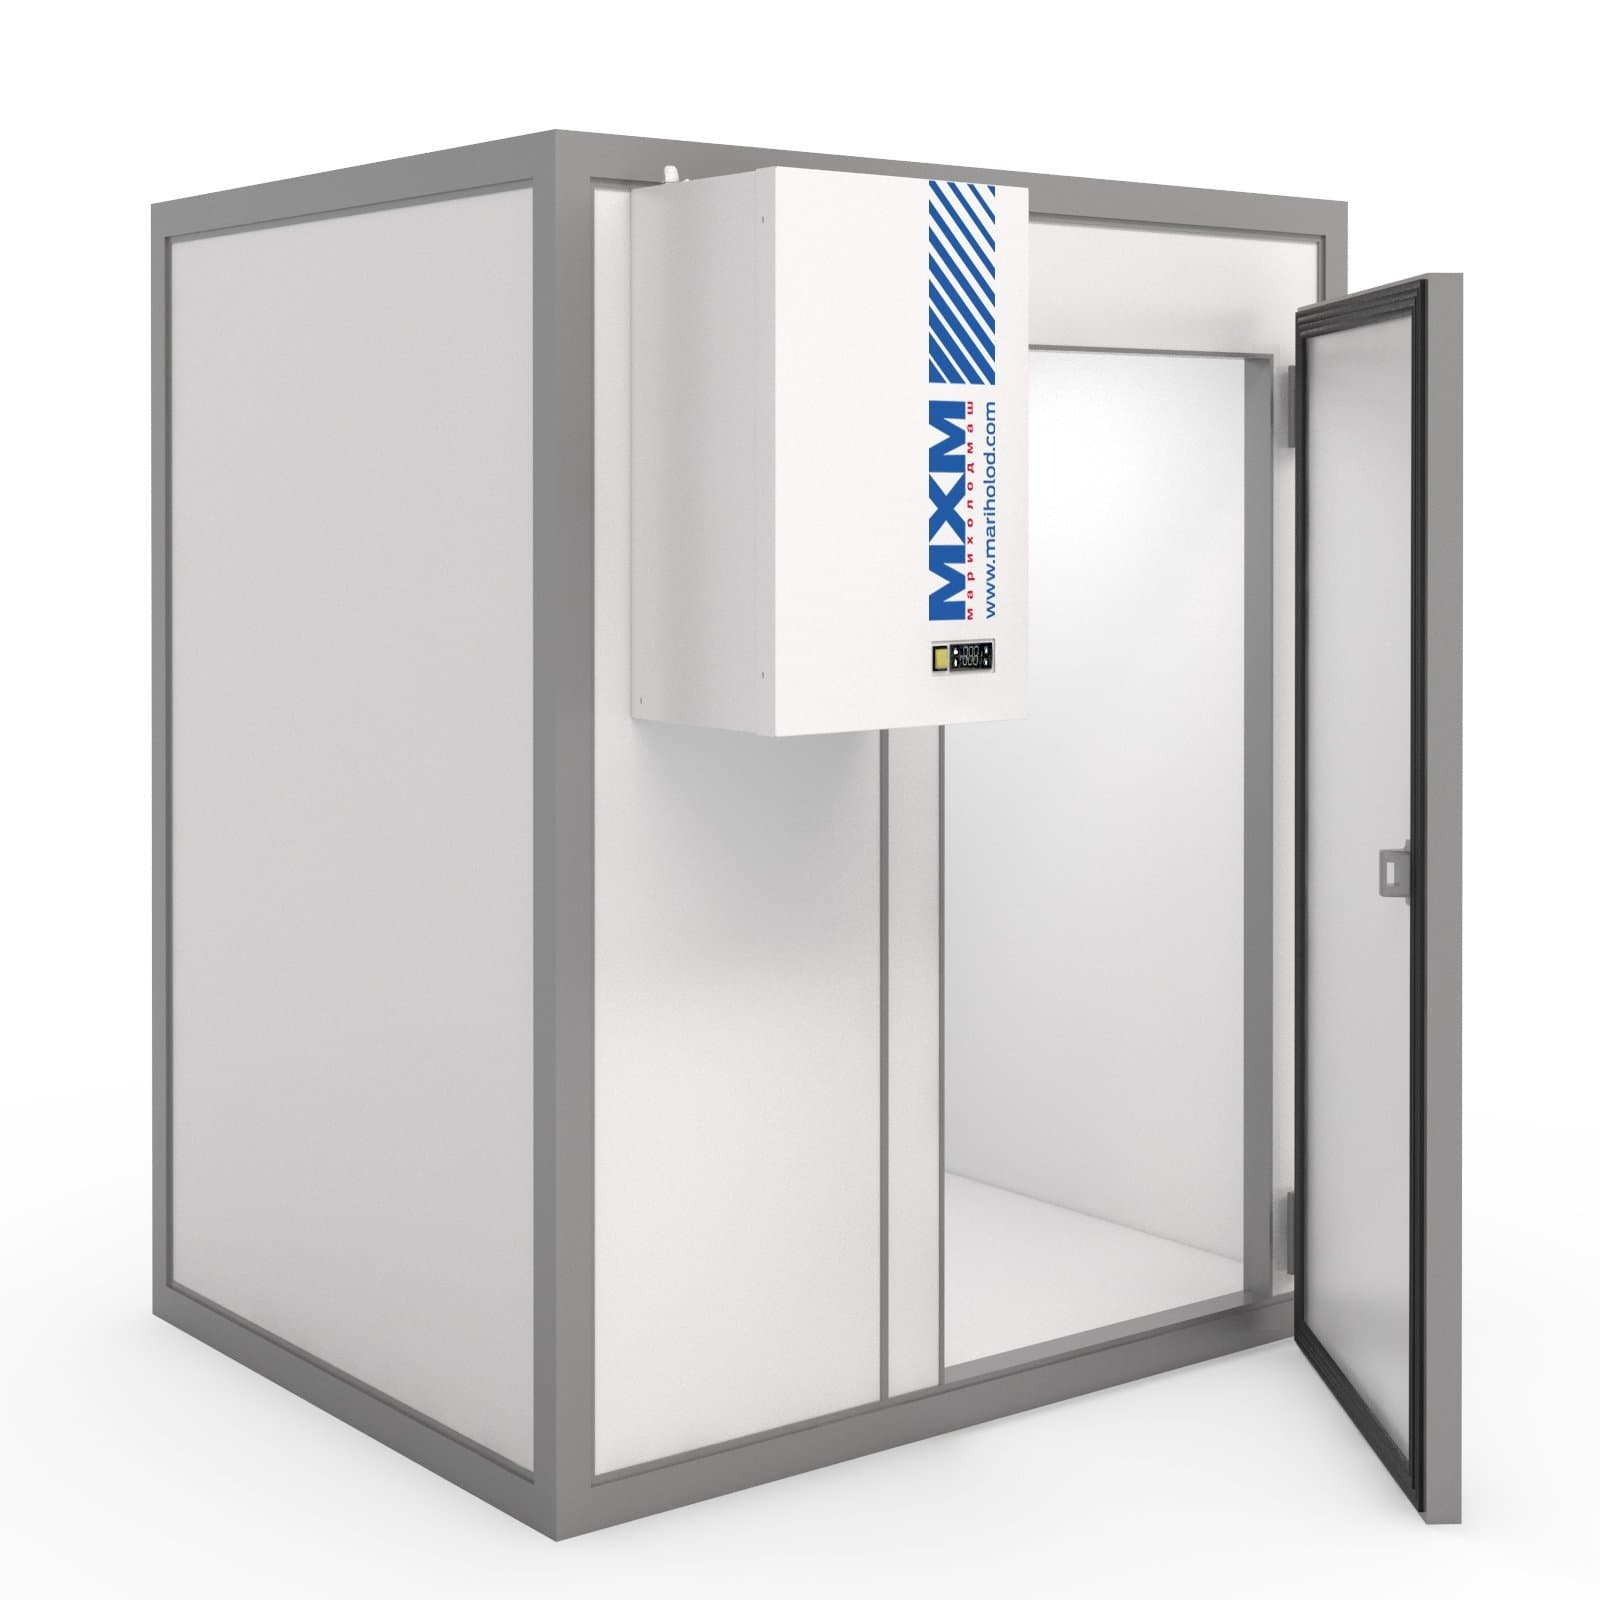 Камера холодильная МХМ КХН-49,68 2560×9160×2460